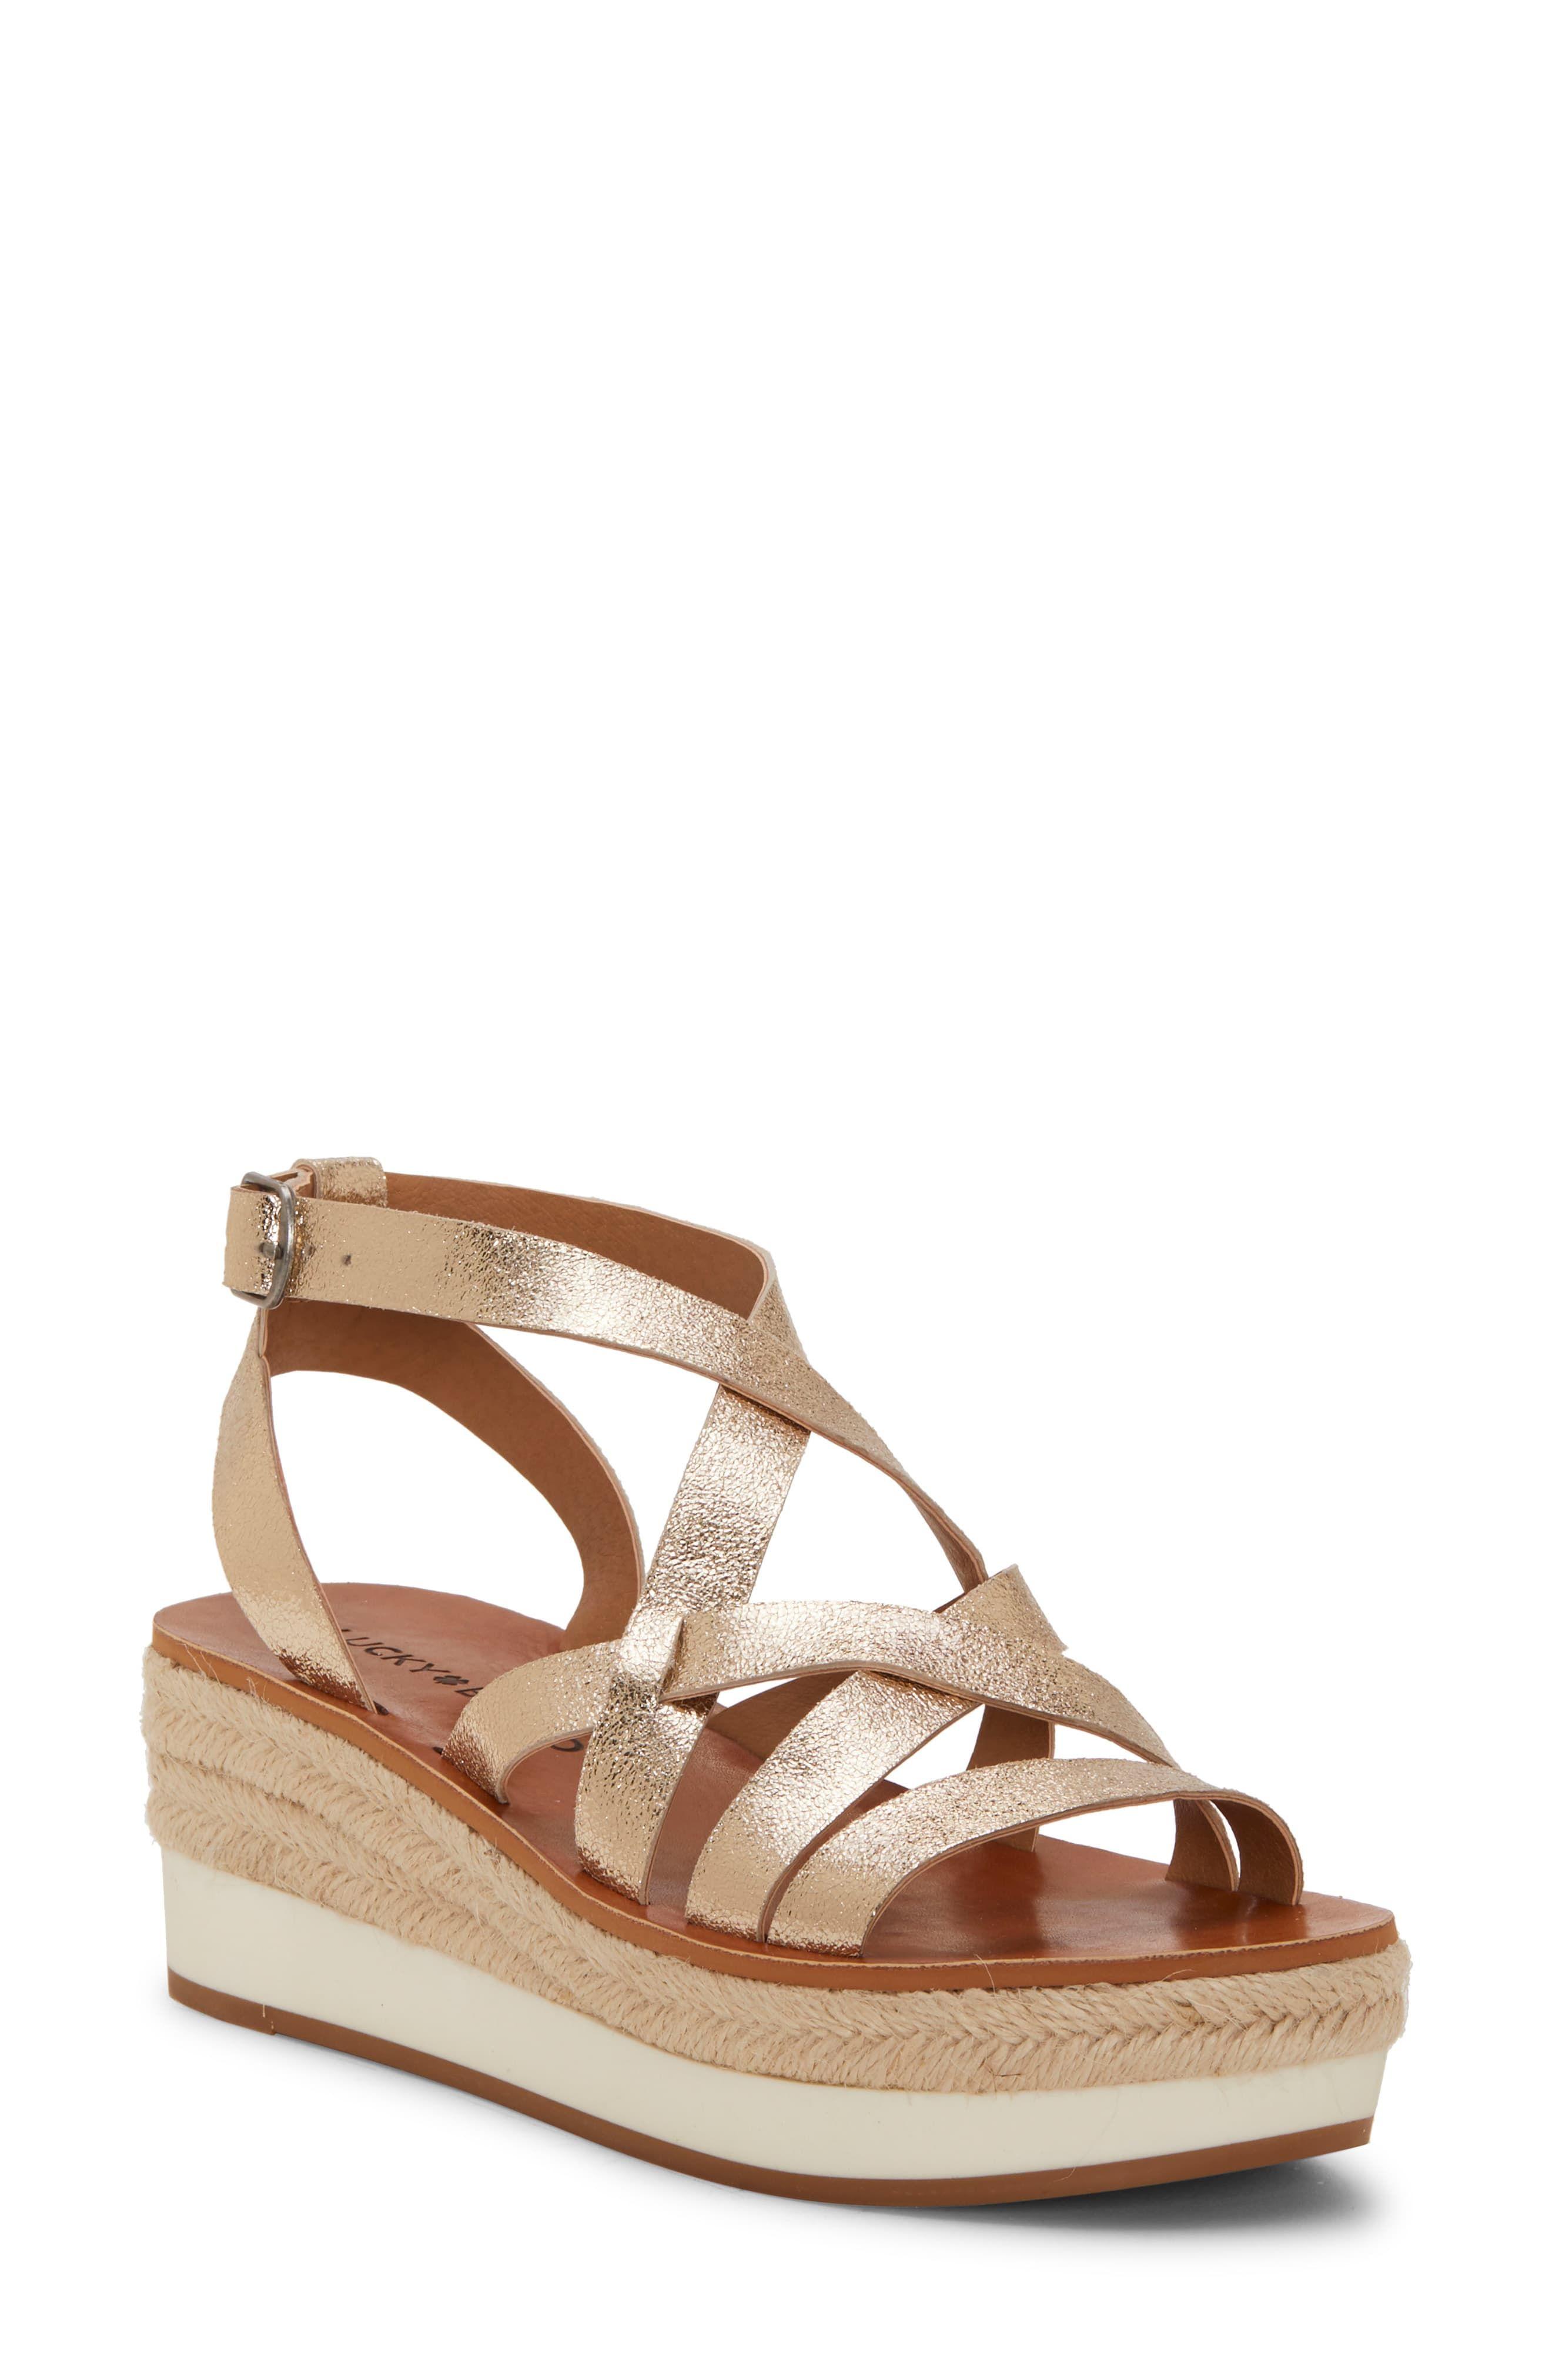 9bbc92992f0 Women's Lucky Brand Jenepper Platform Wedge Sandal, Size 8.5 M ...